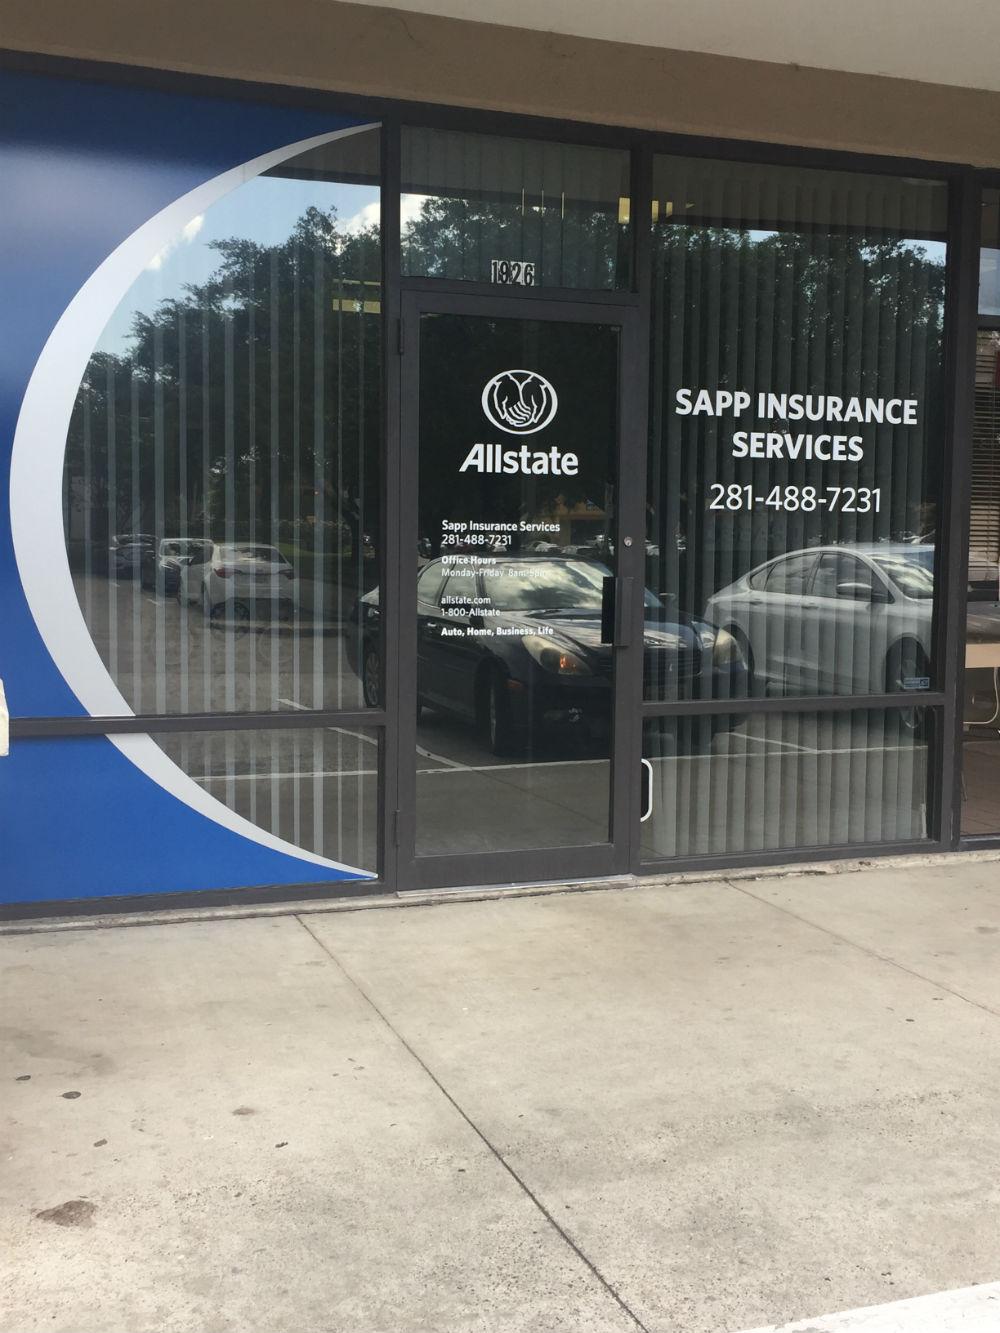 Joseph Sapp: Allstate Insurance image 1